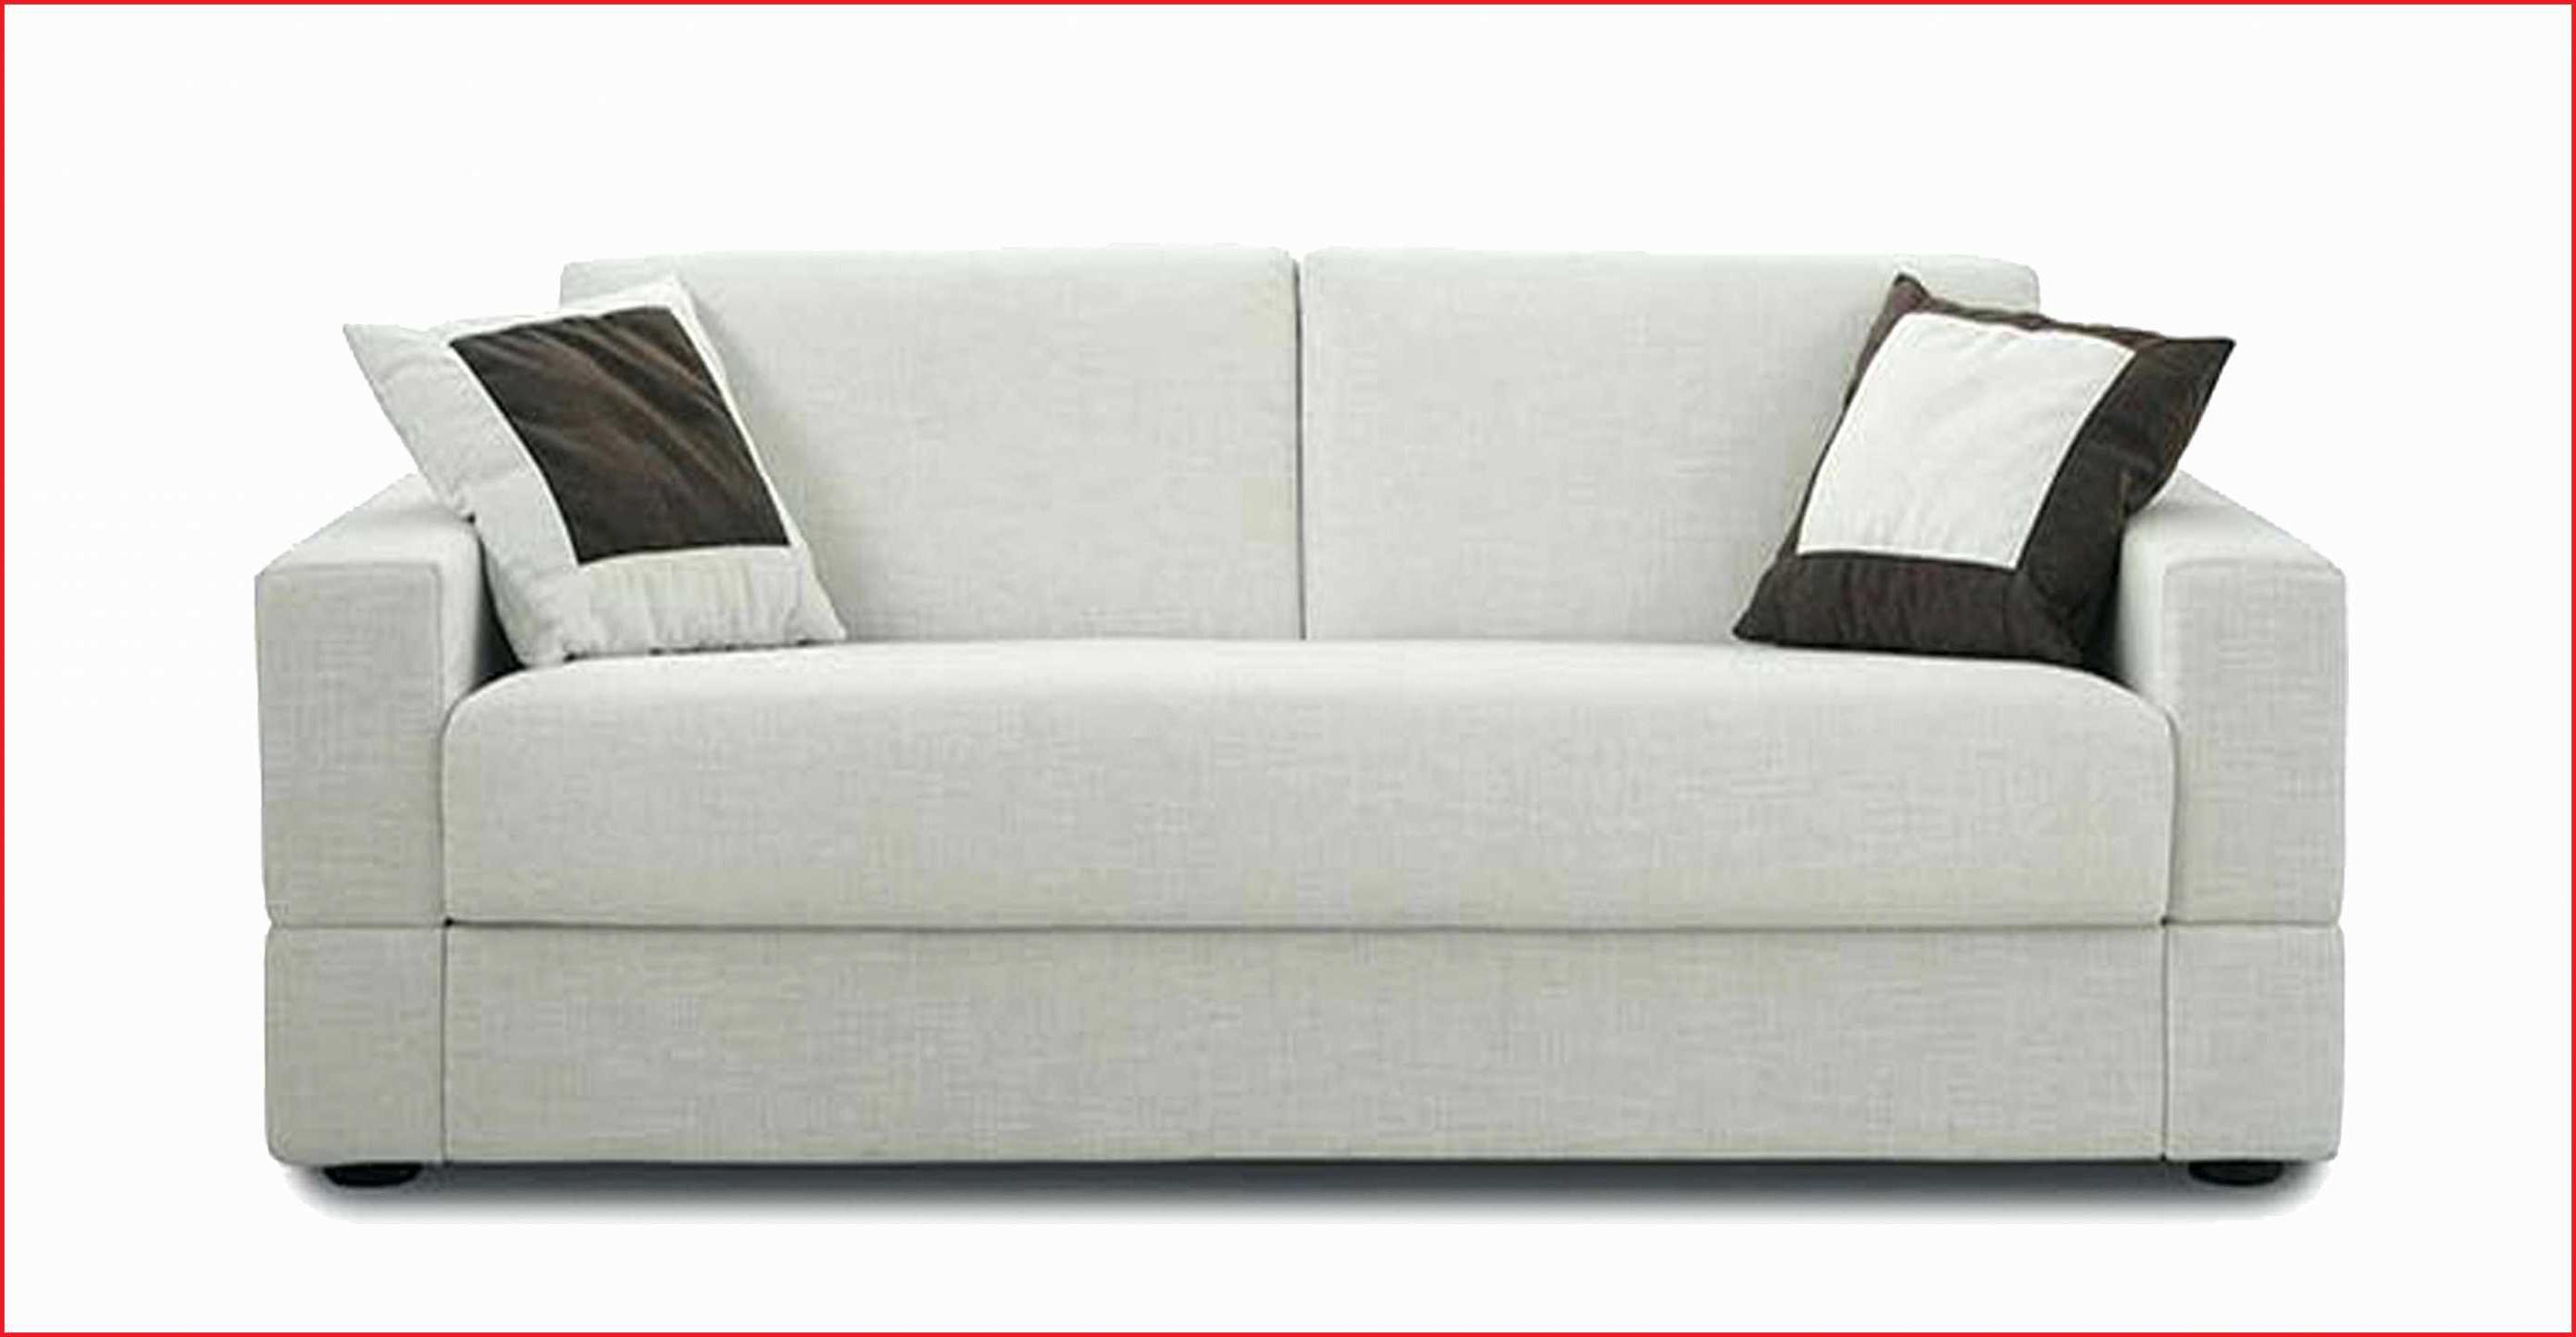 Sofas Ikea Baratos Txdf sofa Cama De Ikea 9 sofa Cama Barato Best sofas Baratos Ikea